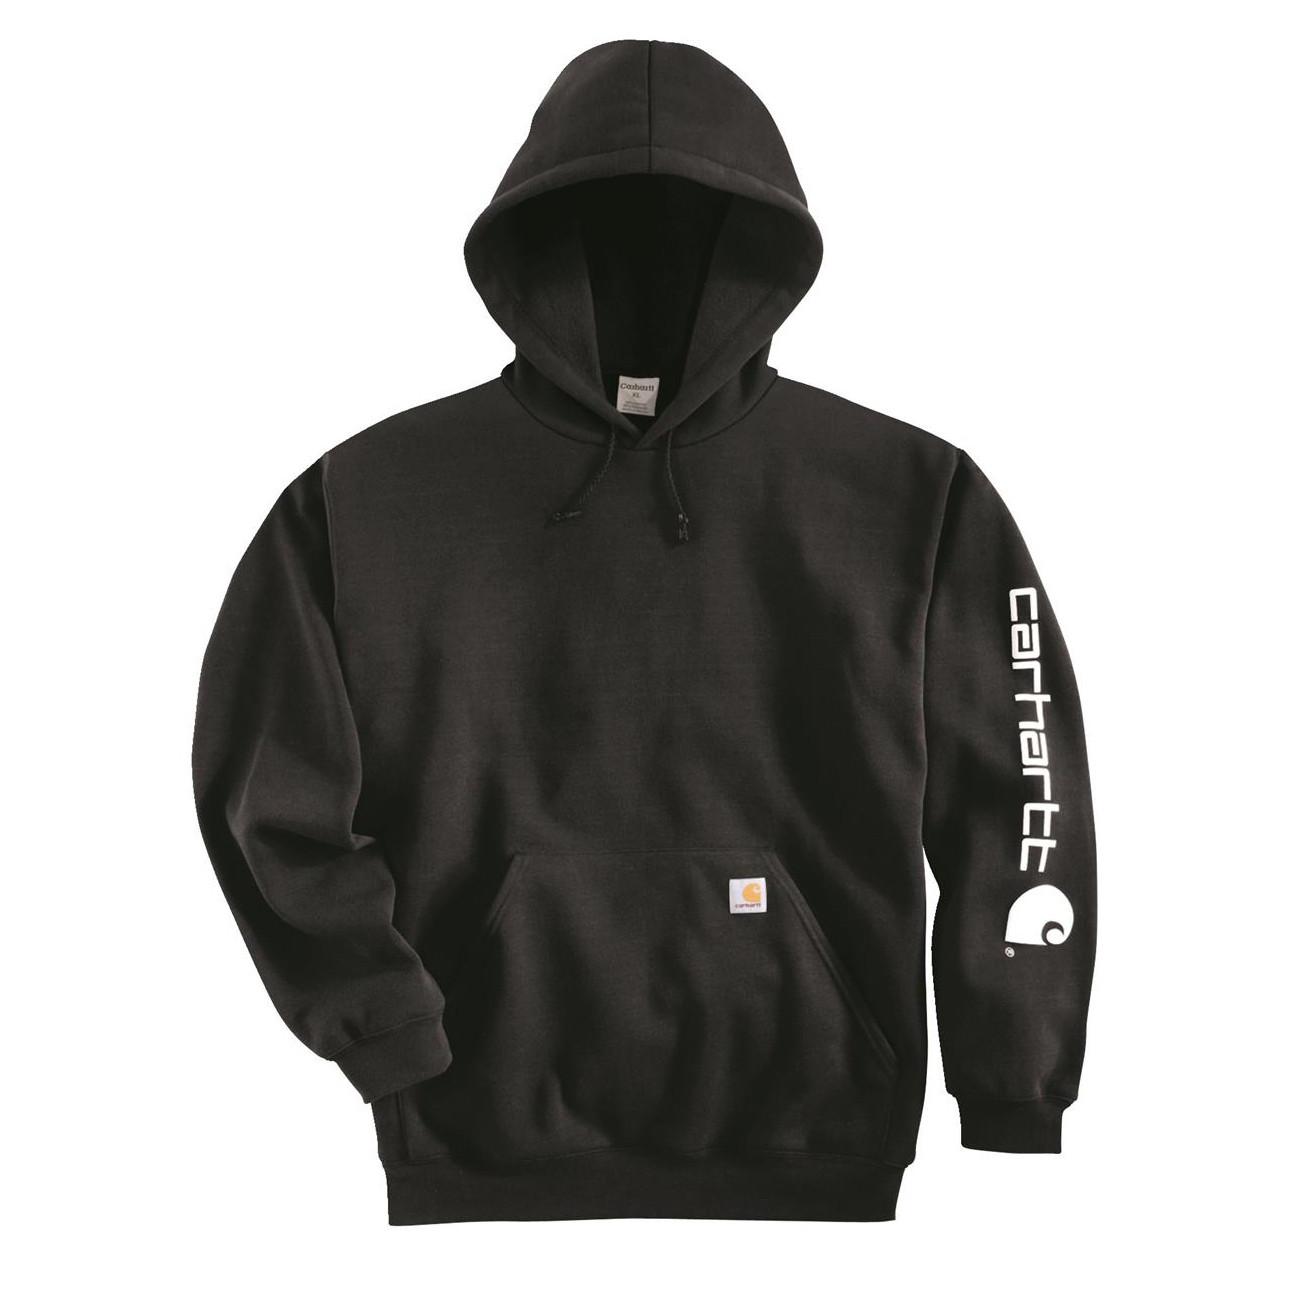 Худи Carhartt Sleeve Logo Hooded Sweatshirt - K288 (Dark Brown, L)